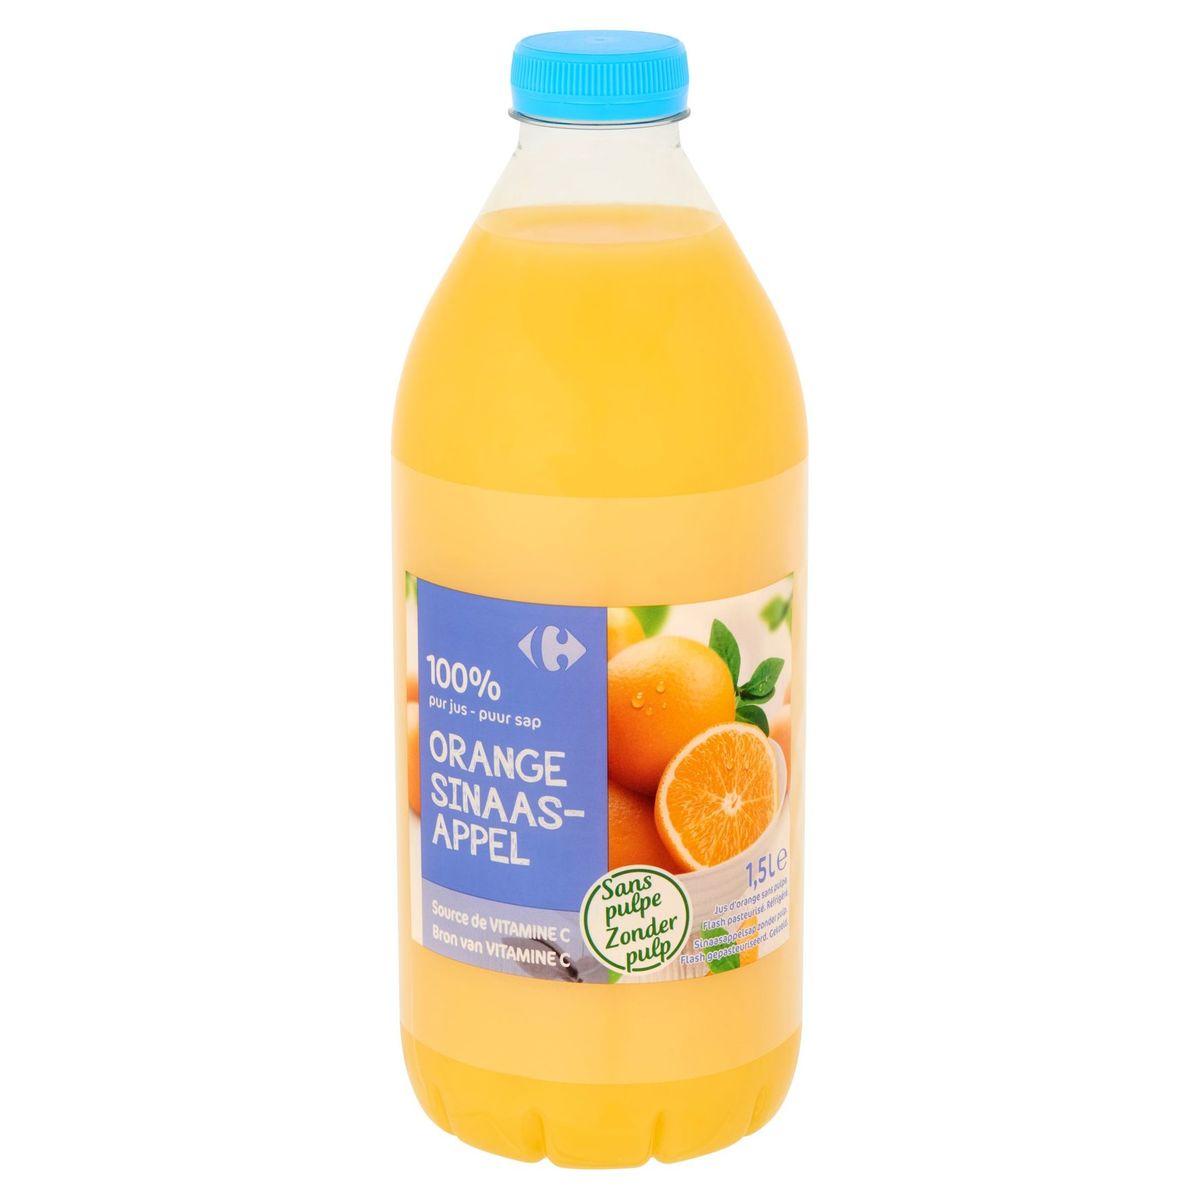 Carrefour 100% Puur Sap Sinaasappel zonder Pulp 1.5 L